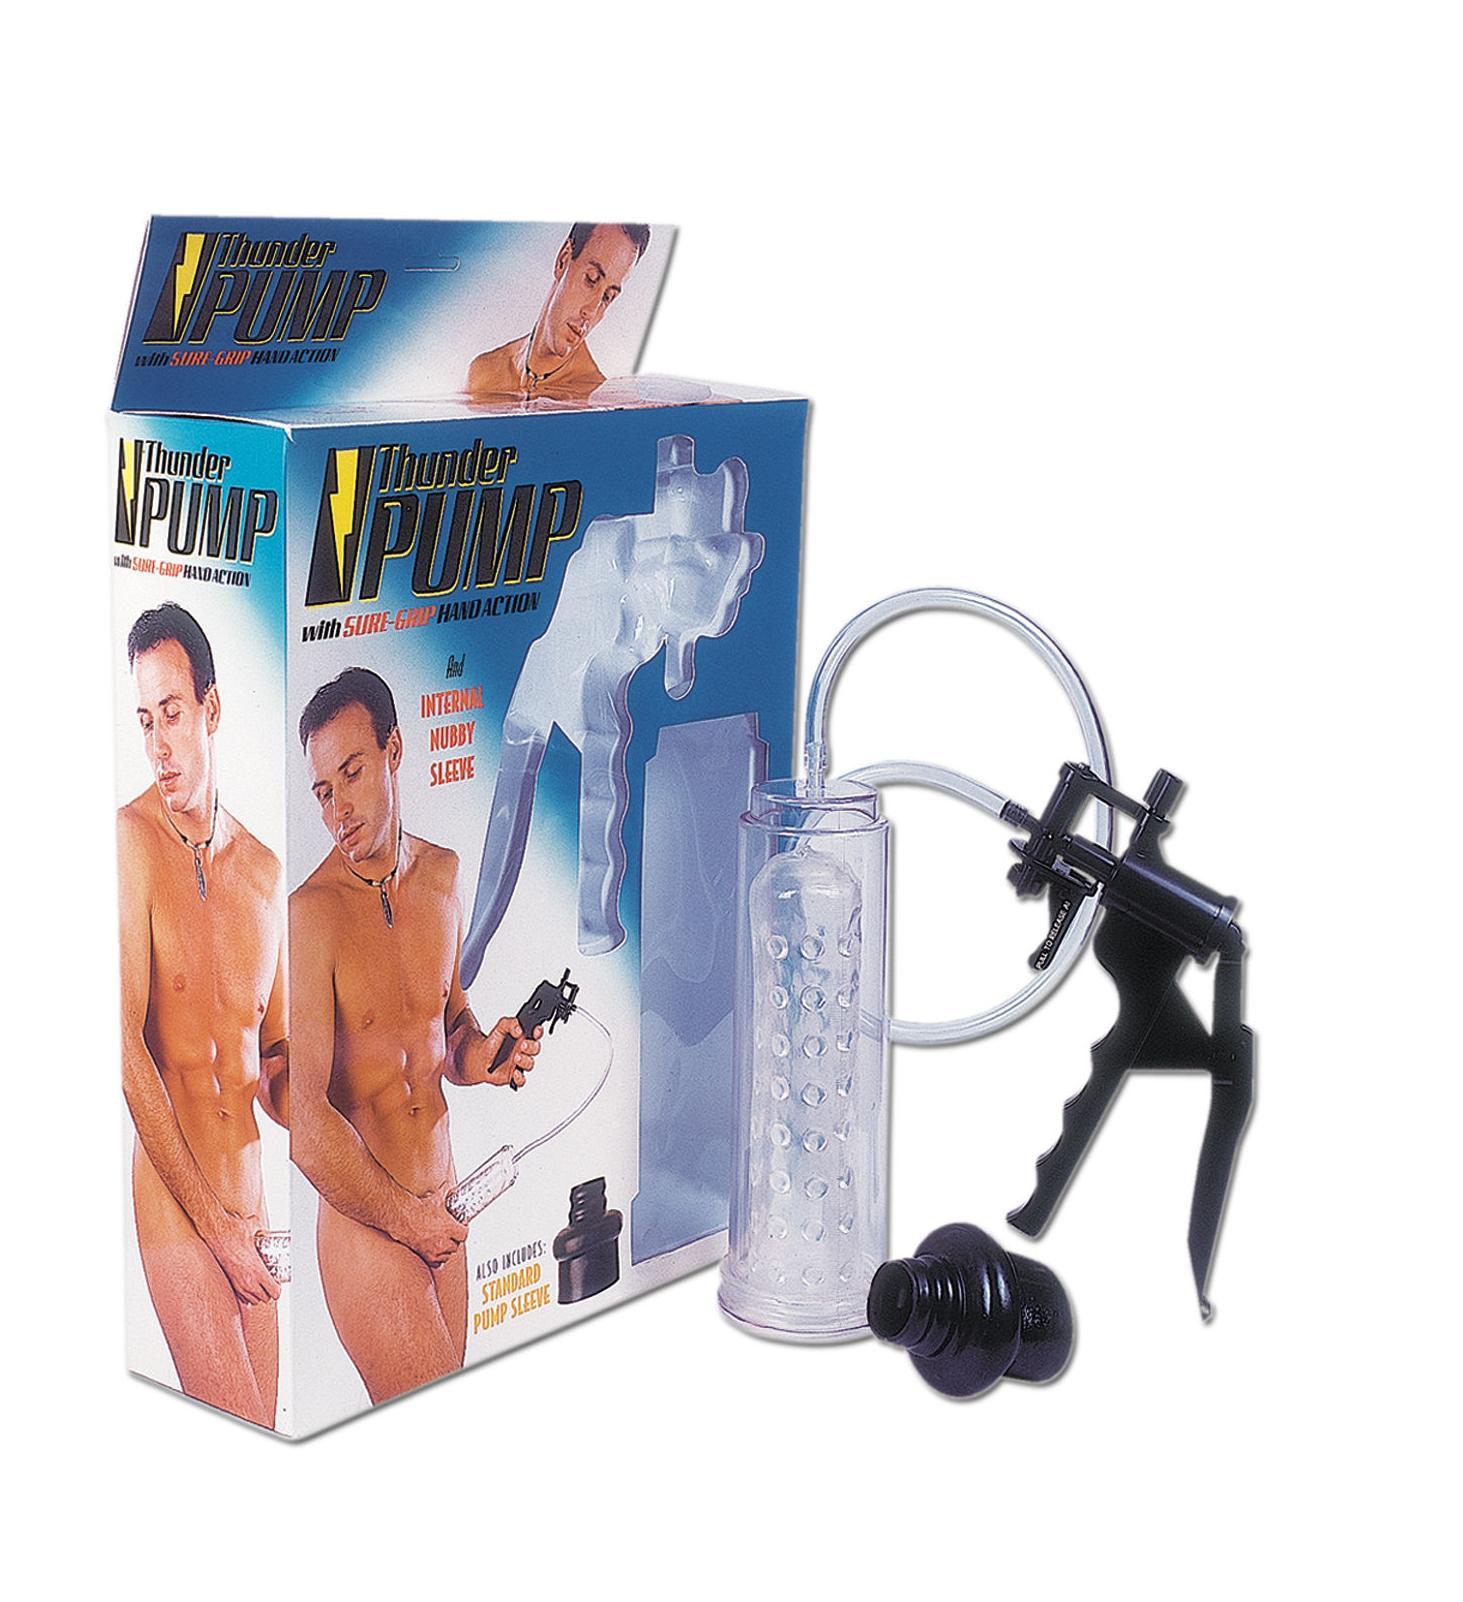 Developer con pistola y bolsa de silicona thunder pump